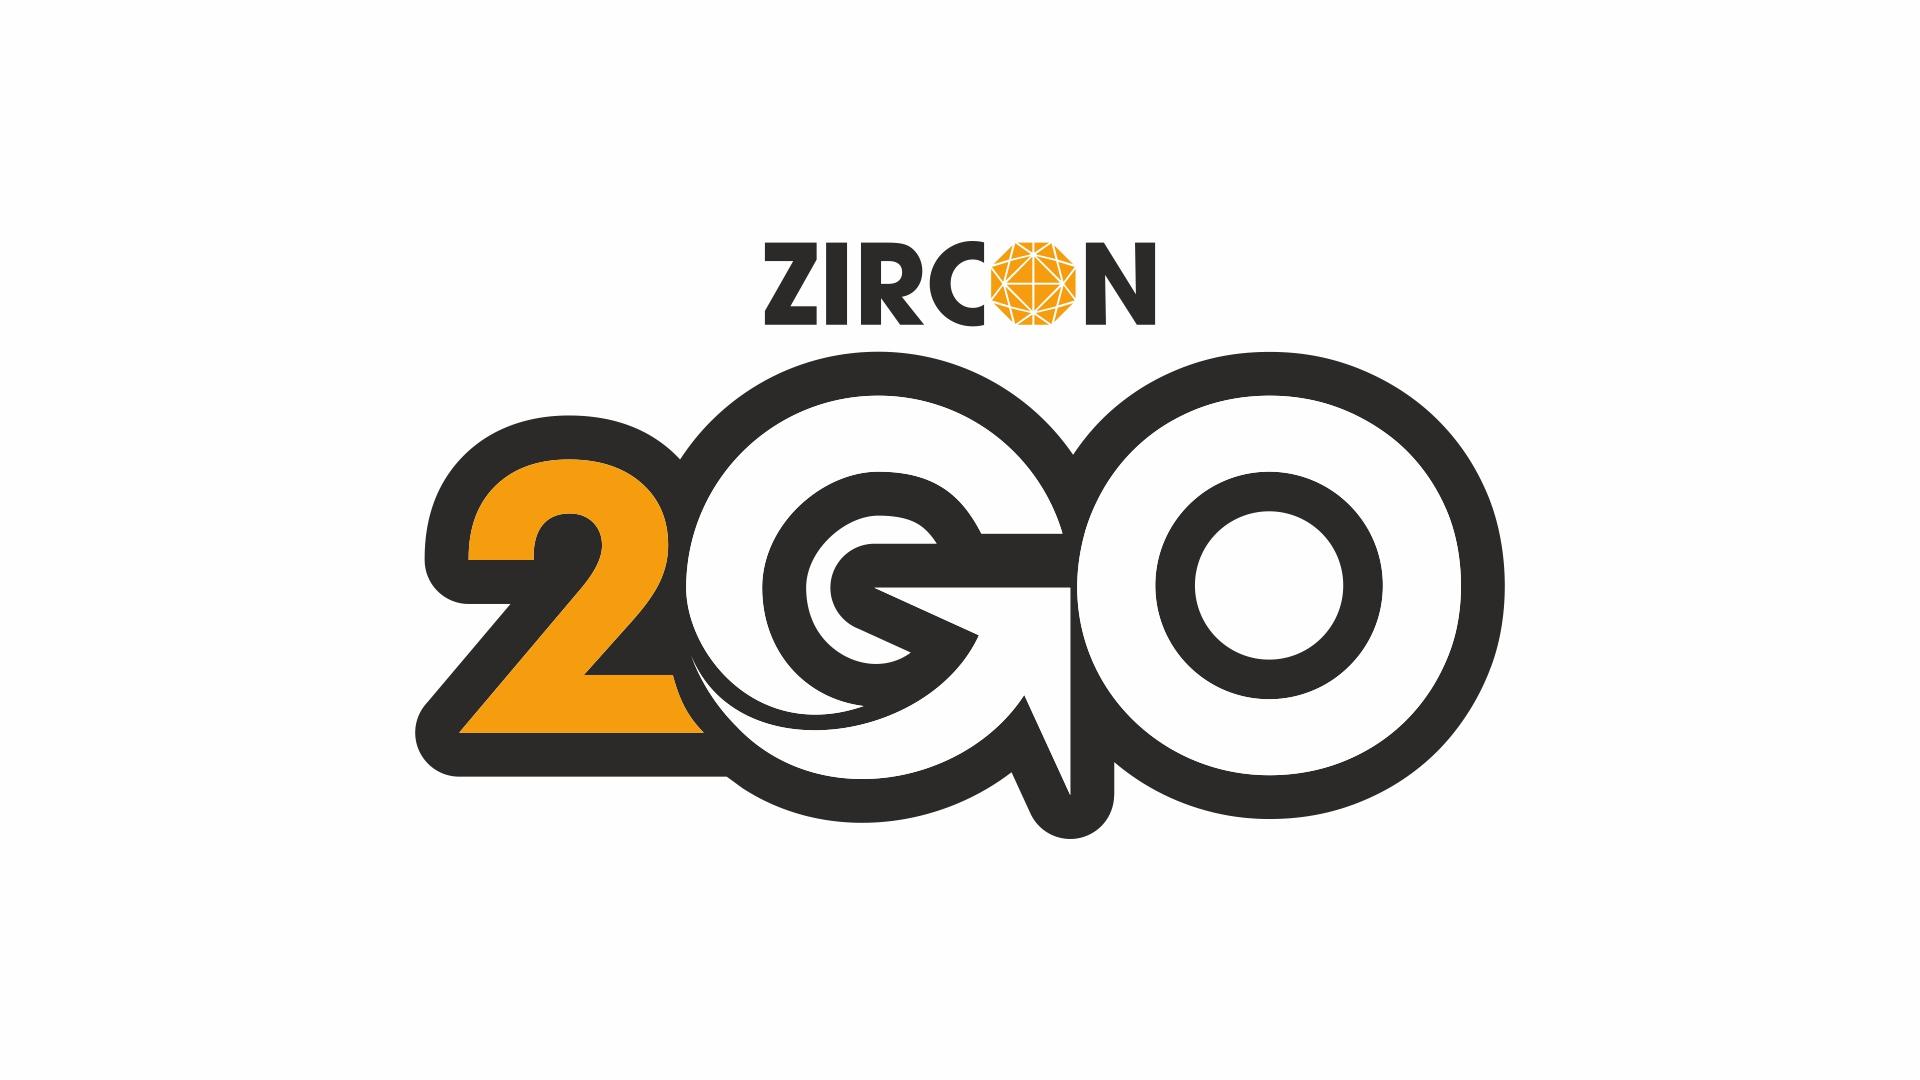 ZIRCON2GO - Logotipo